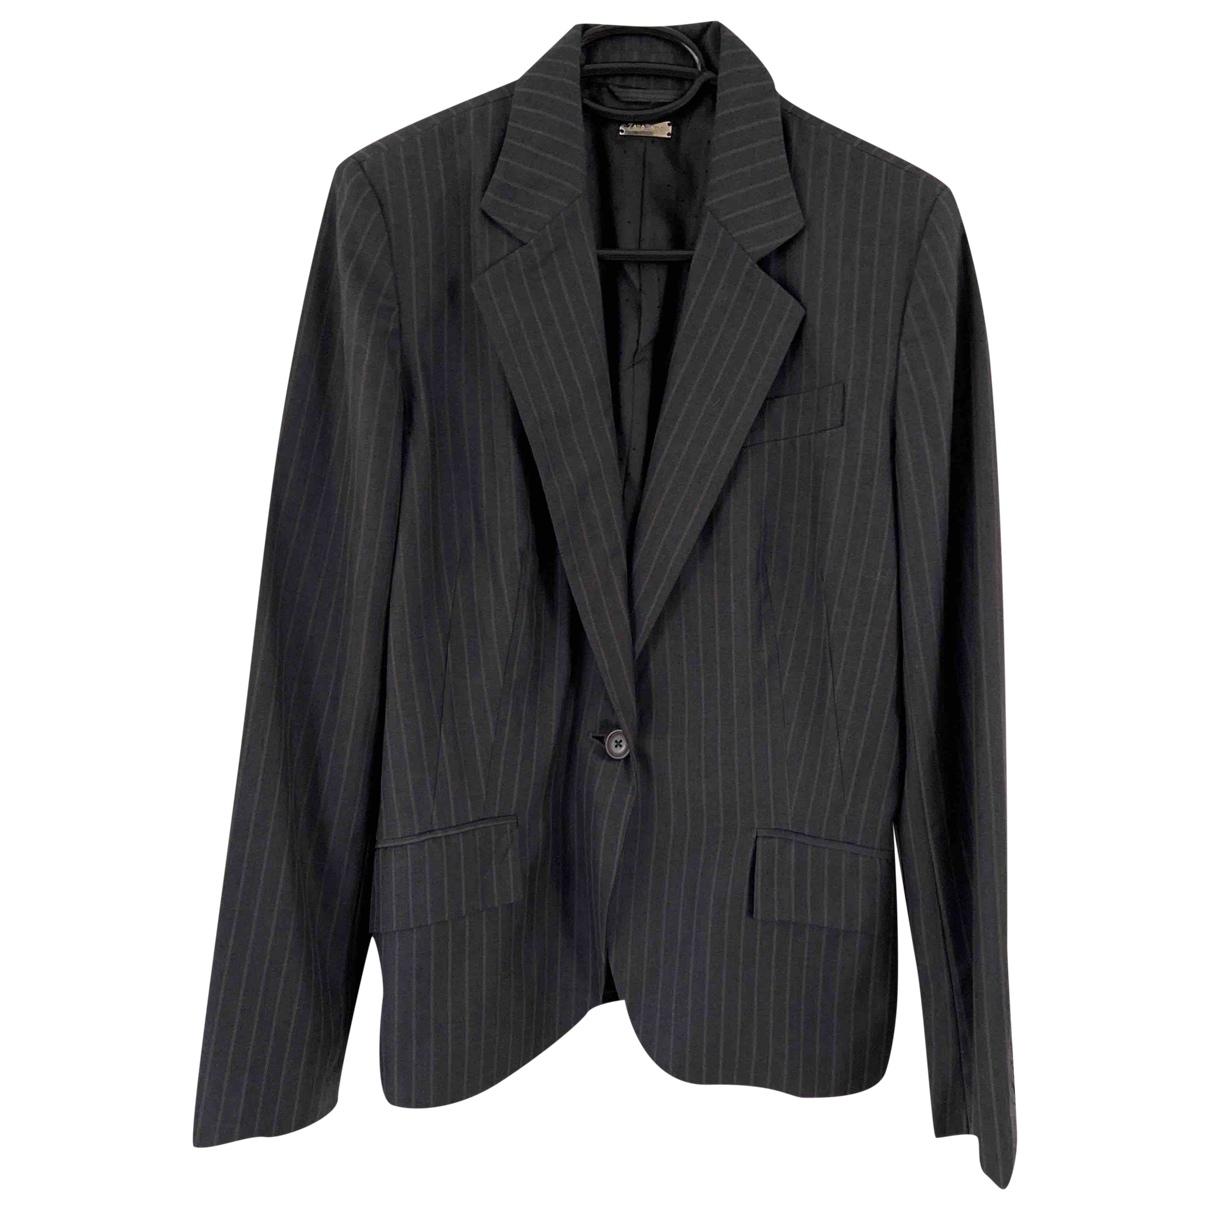 Zara \N Brown Cotton coat for Women 38 FR